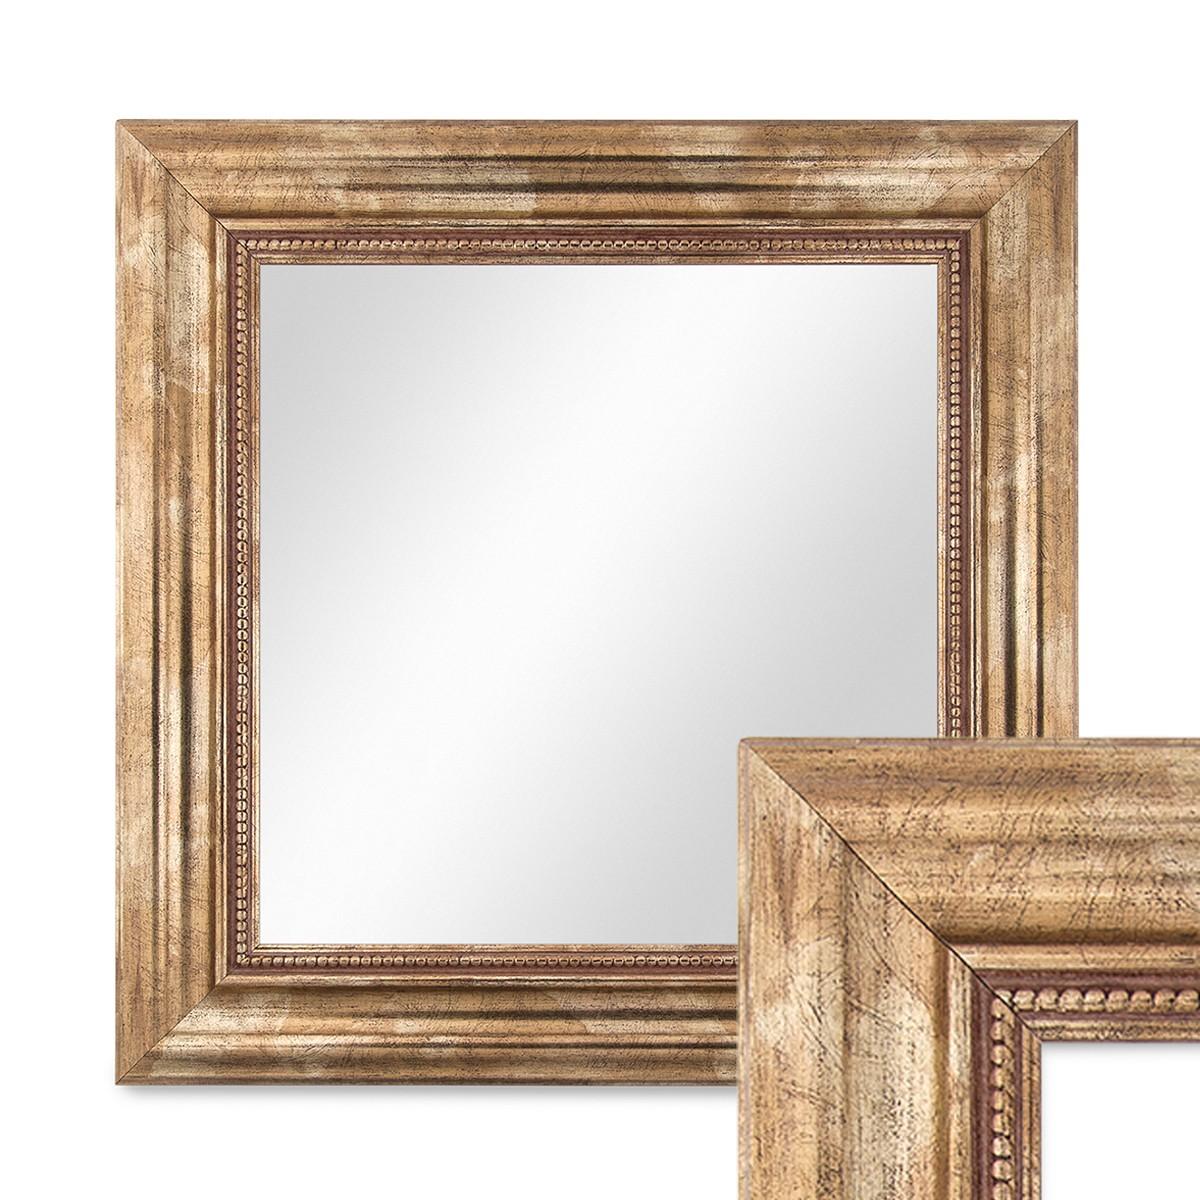 wand spiegel 40x40 cm im massivholz rahmen barock stil antik gold quadratisch spiegelfl che. Black Bedroom Furniture Sets. Home Design Ideas